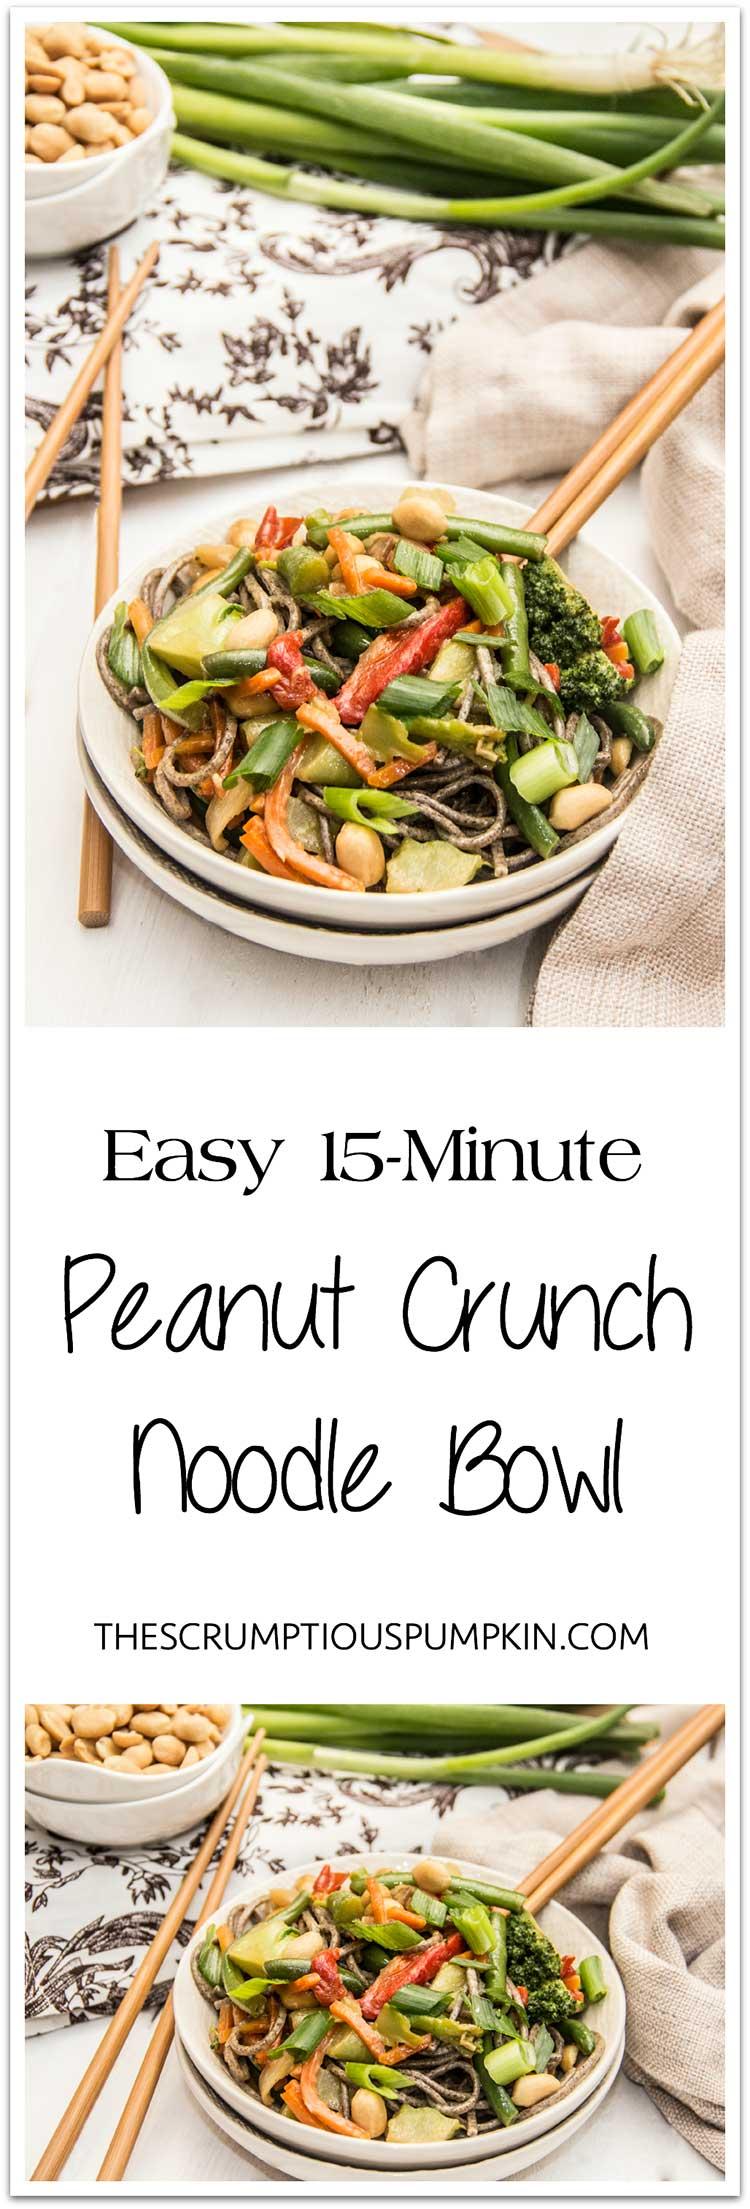 Easy-15-Minute-Peanut-Crunch-Noodle-Bowl